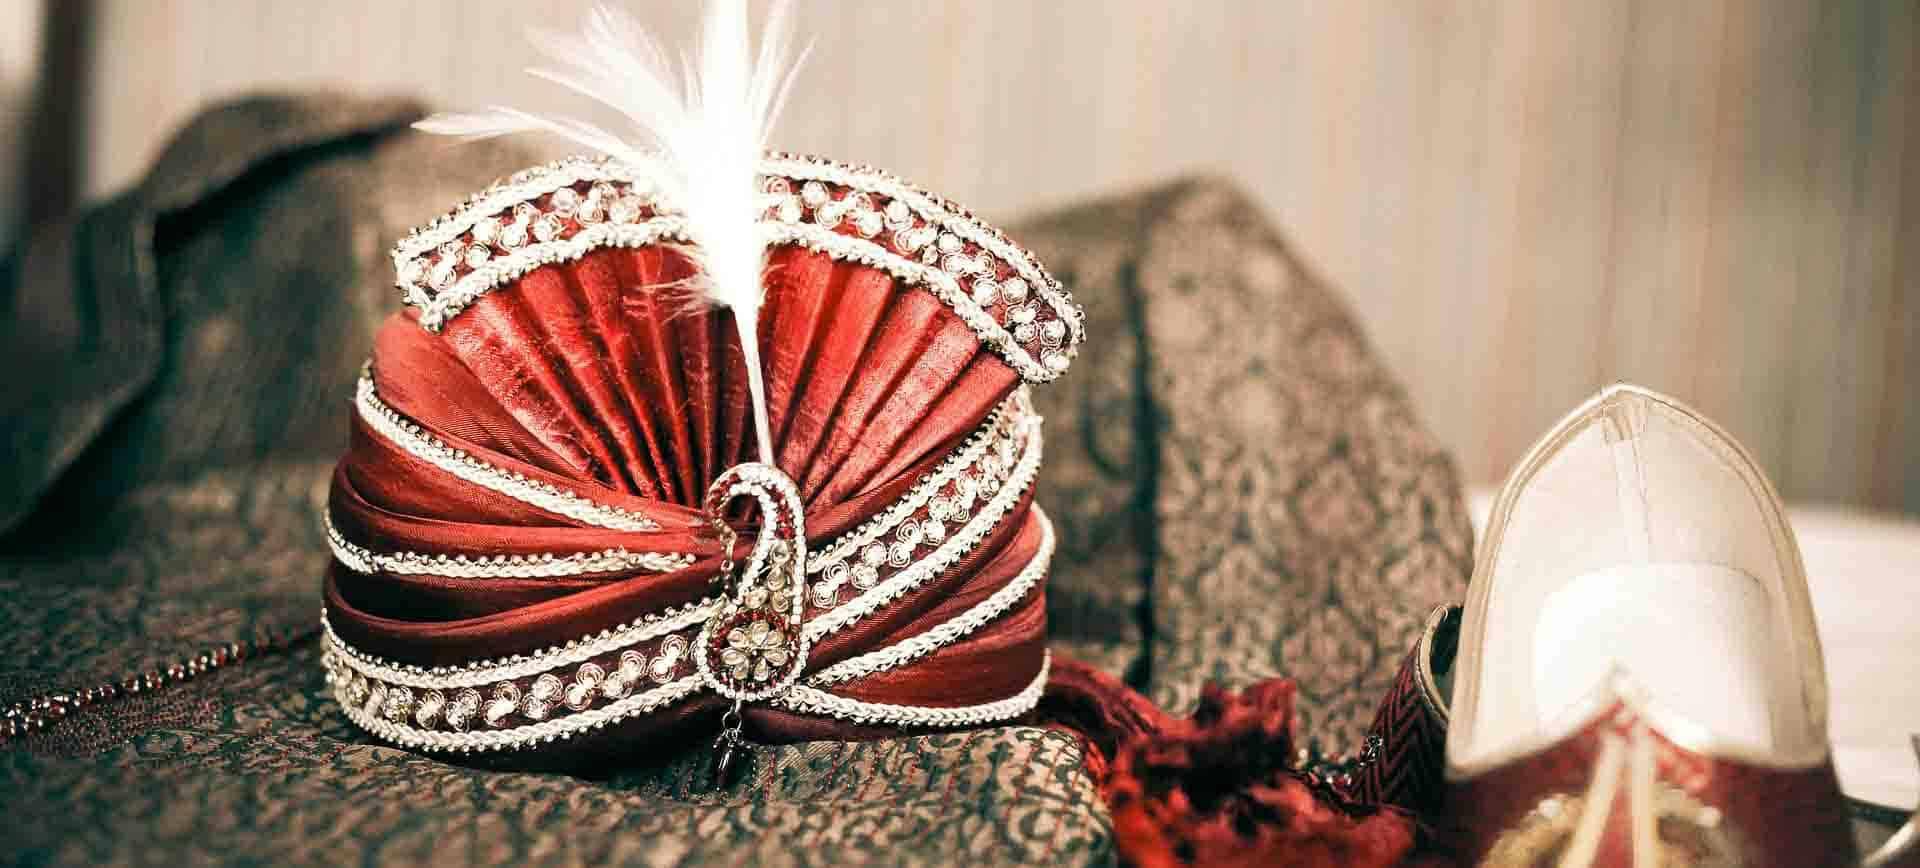 Kopfschmuck eines indischen Maharadschas